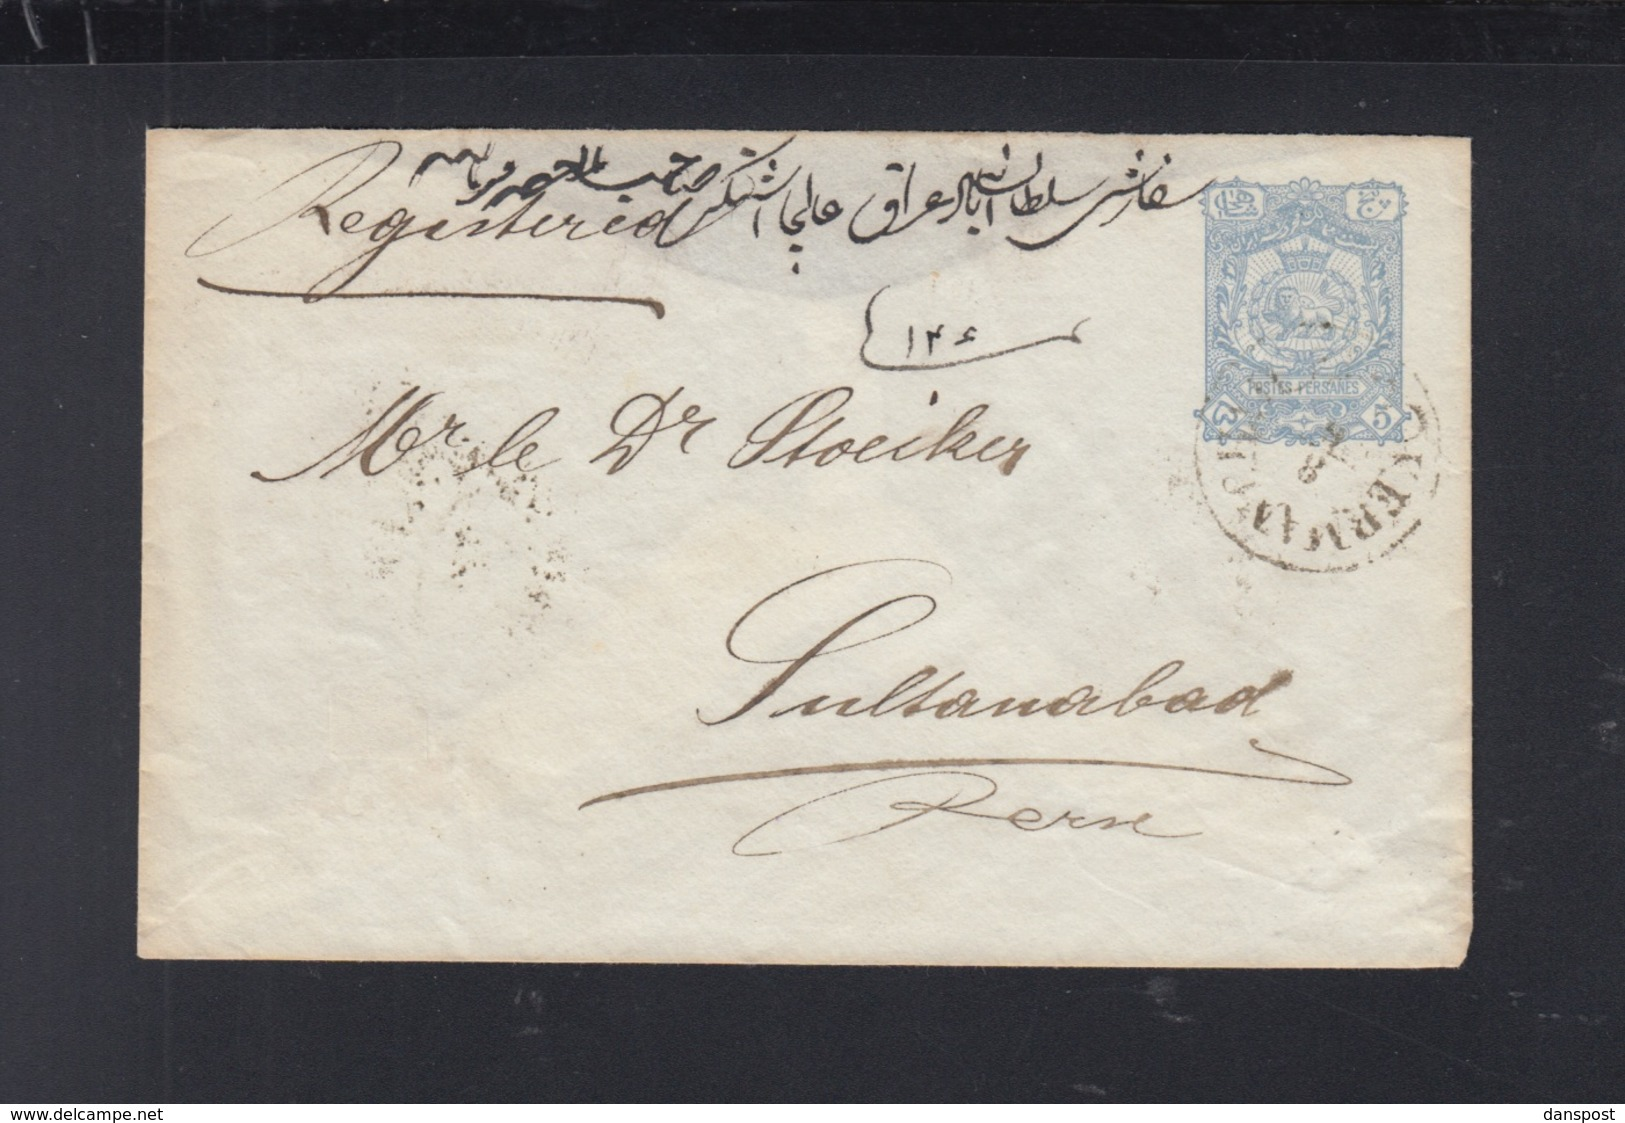 Persia Iran Stationery Cover Registered - Iran